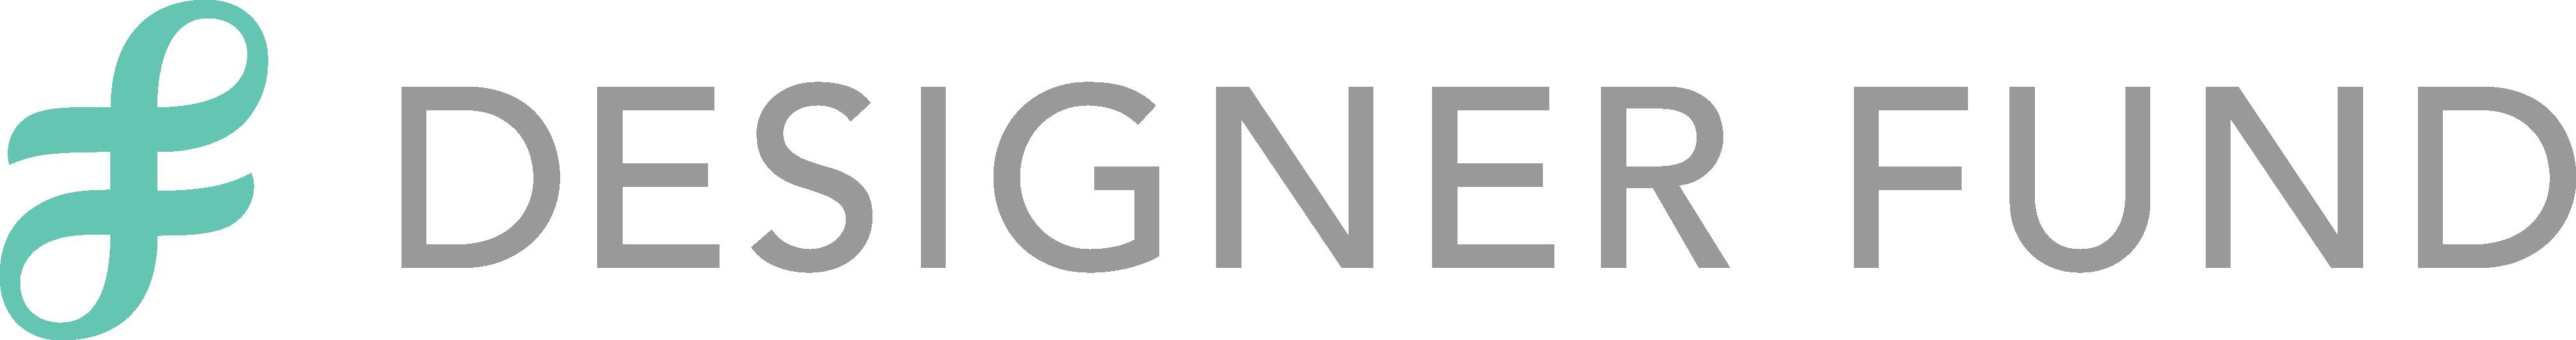 Designer Fund logo